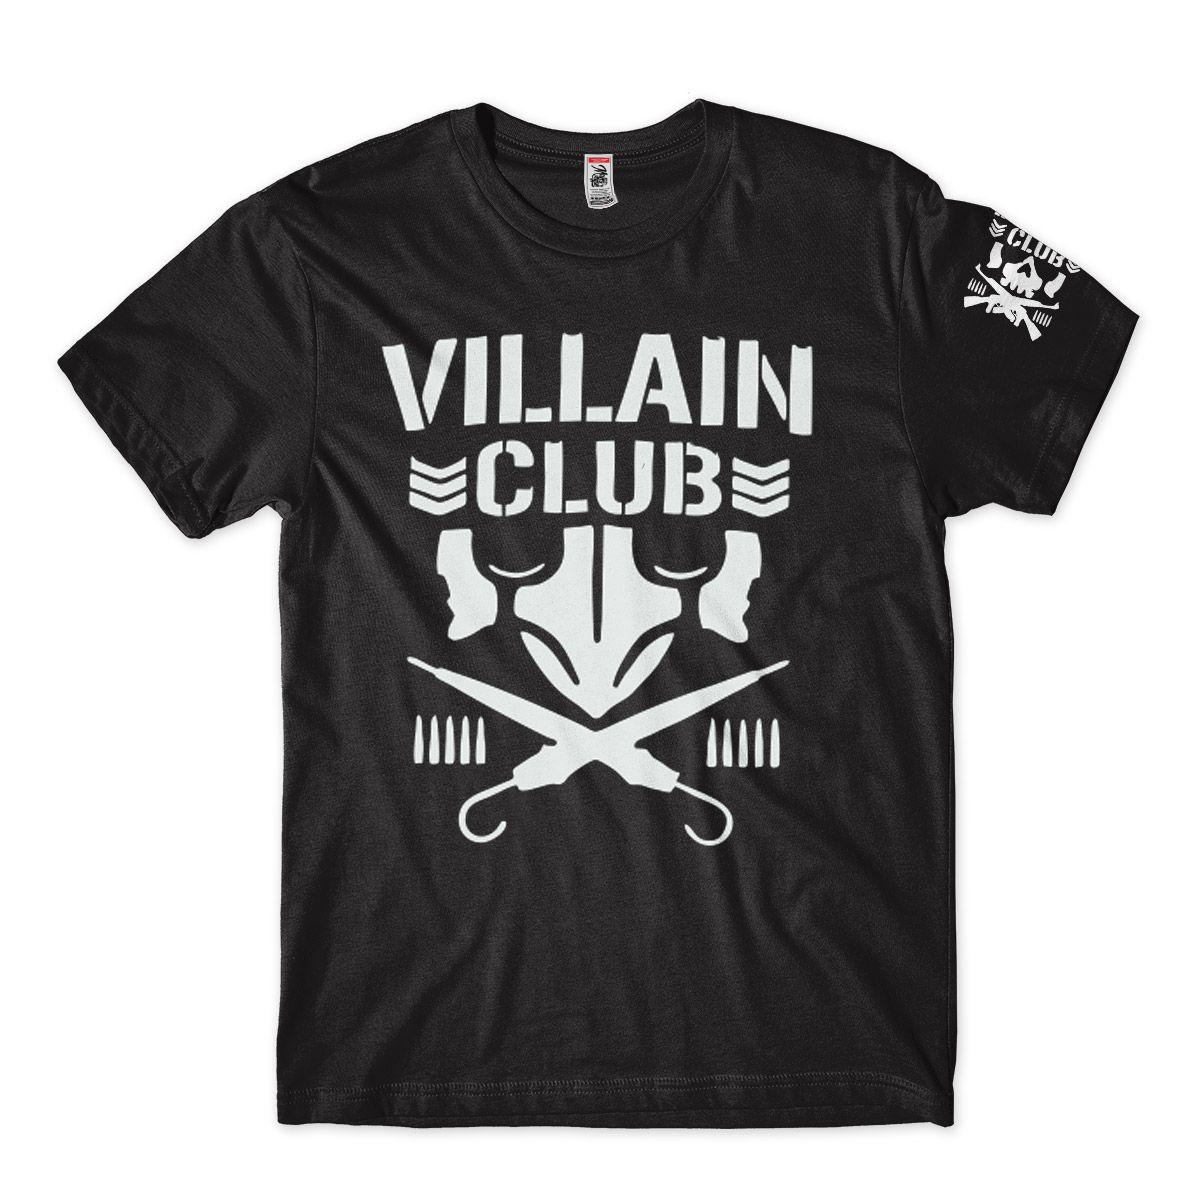 Camiseta Wwe Villain Club Njpw Masculina Pro Wrestling Preta